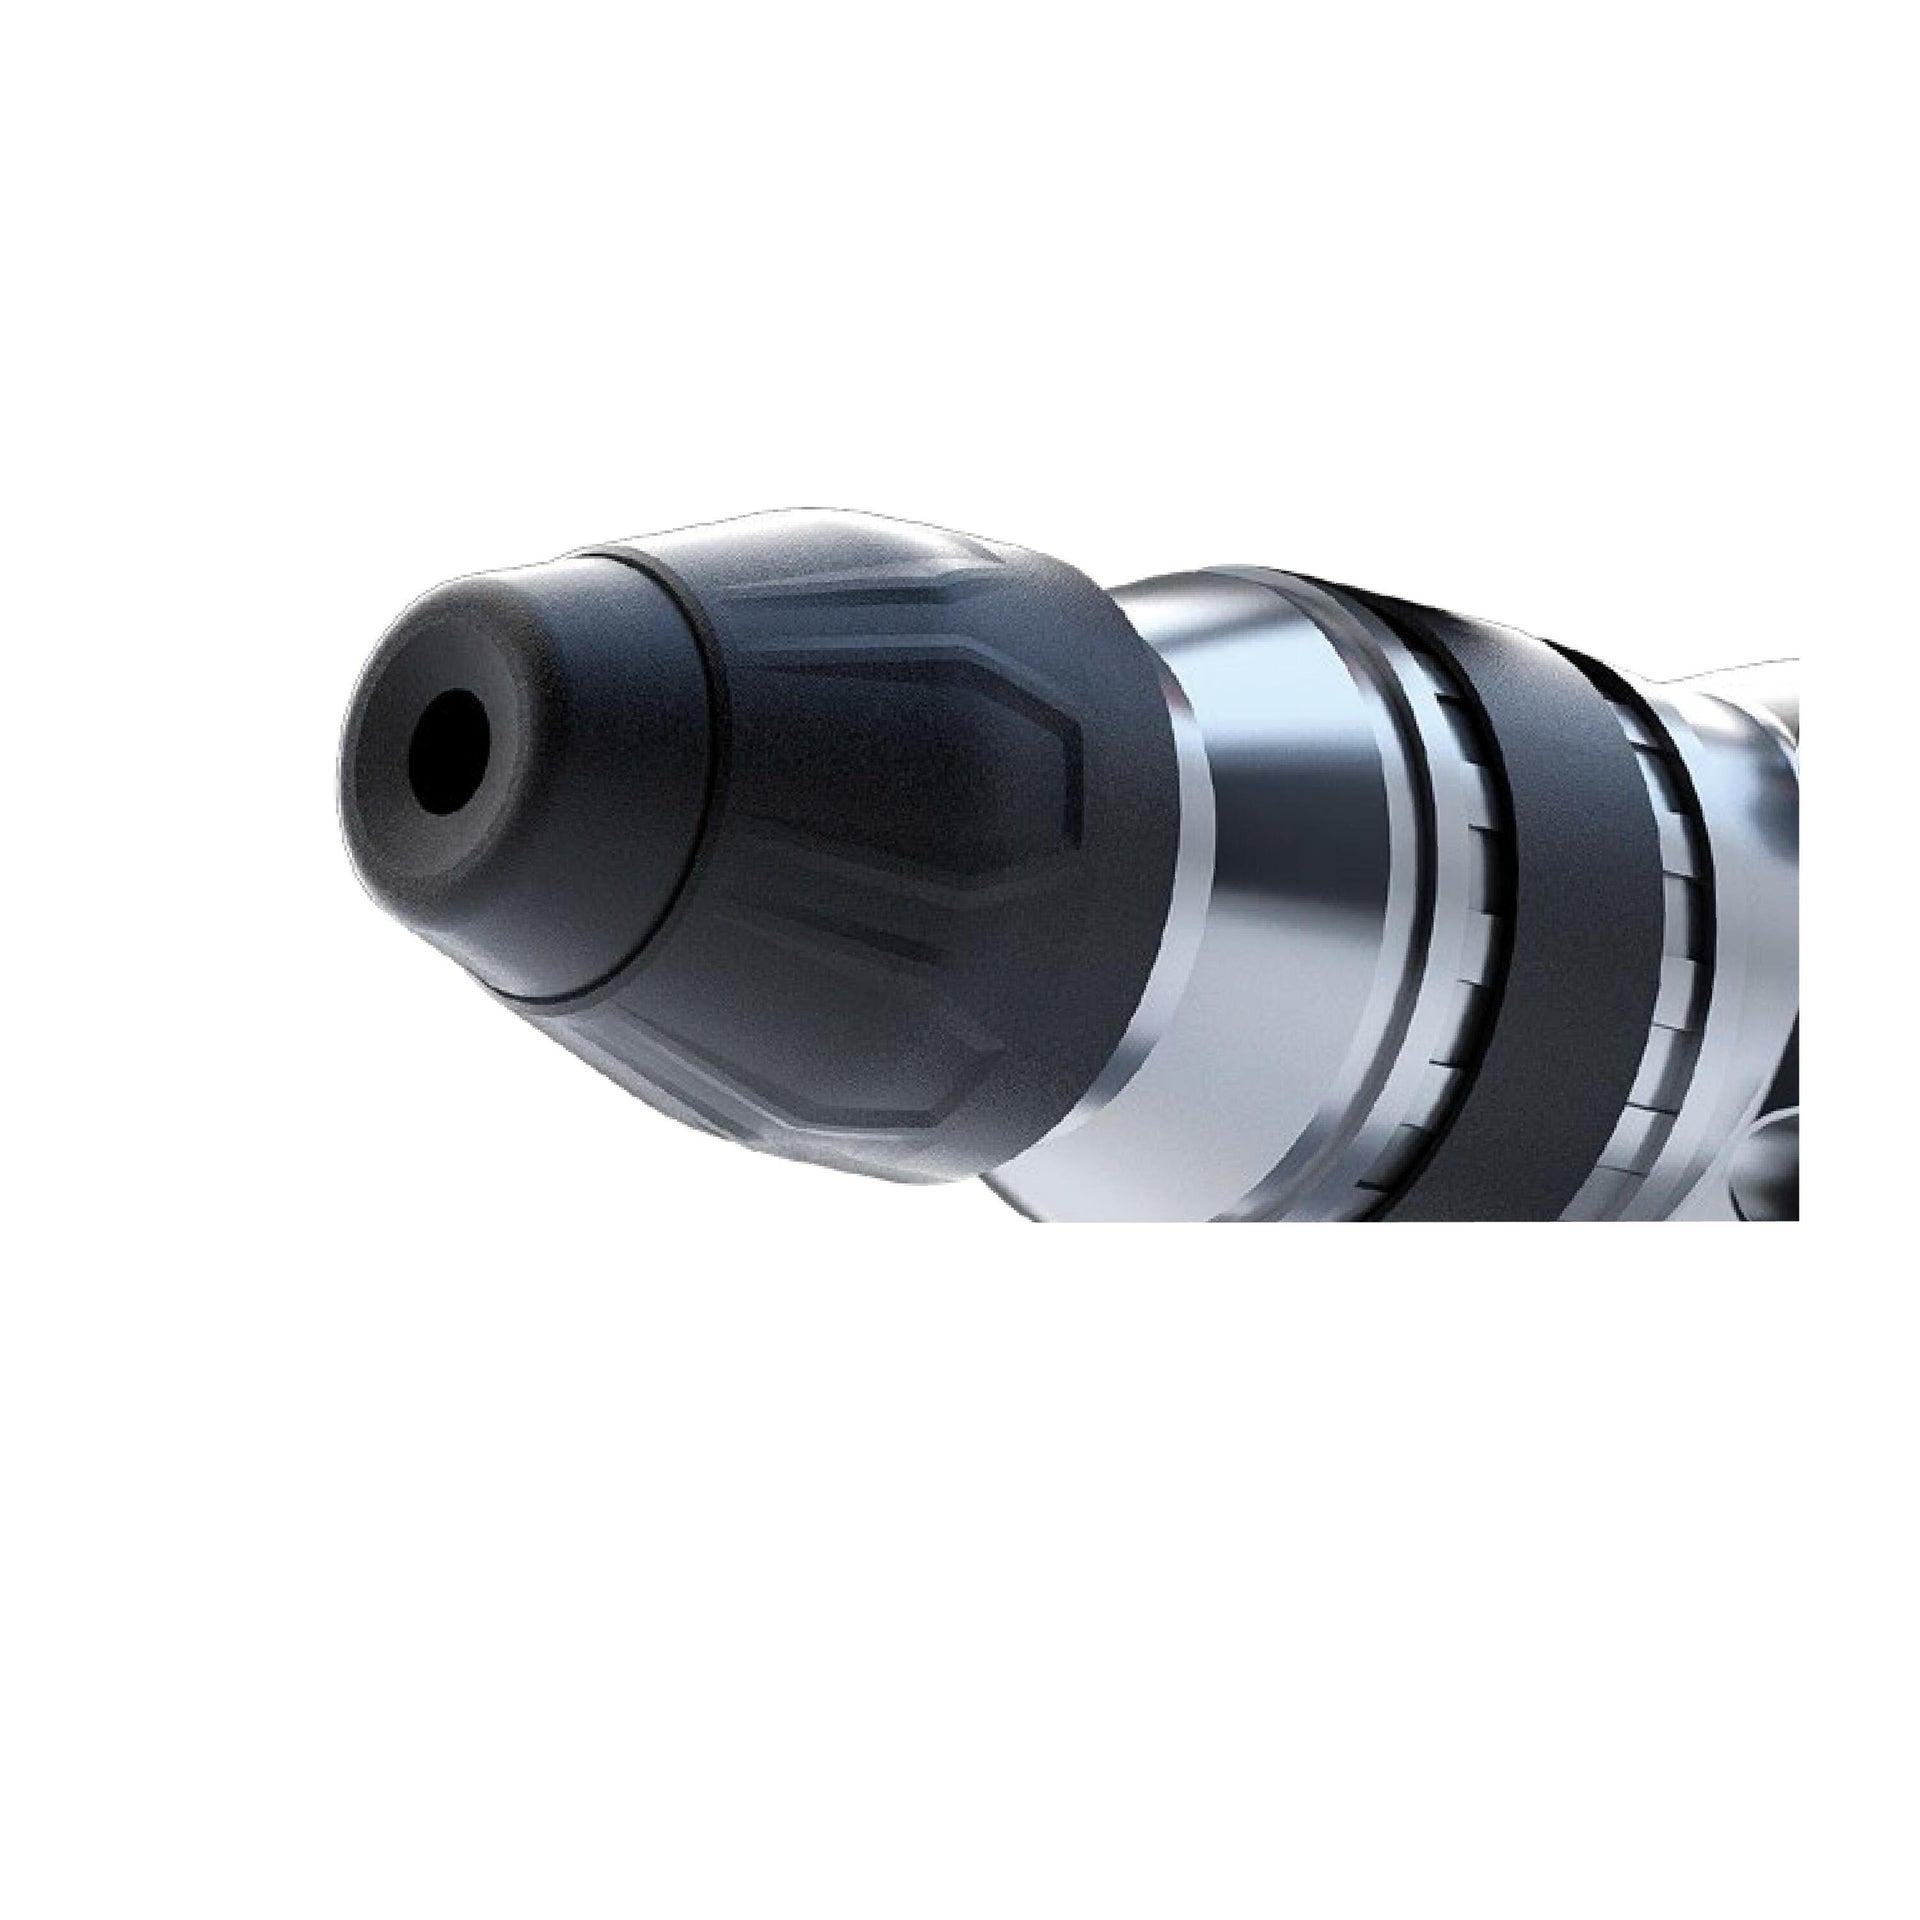 Martello perforatore con filo DEXTER POWER Z1C-HW-3218SEP SDS Plus 850 giri/min 1500 W - 3